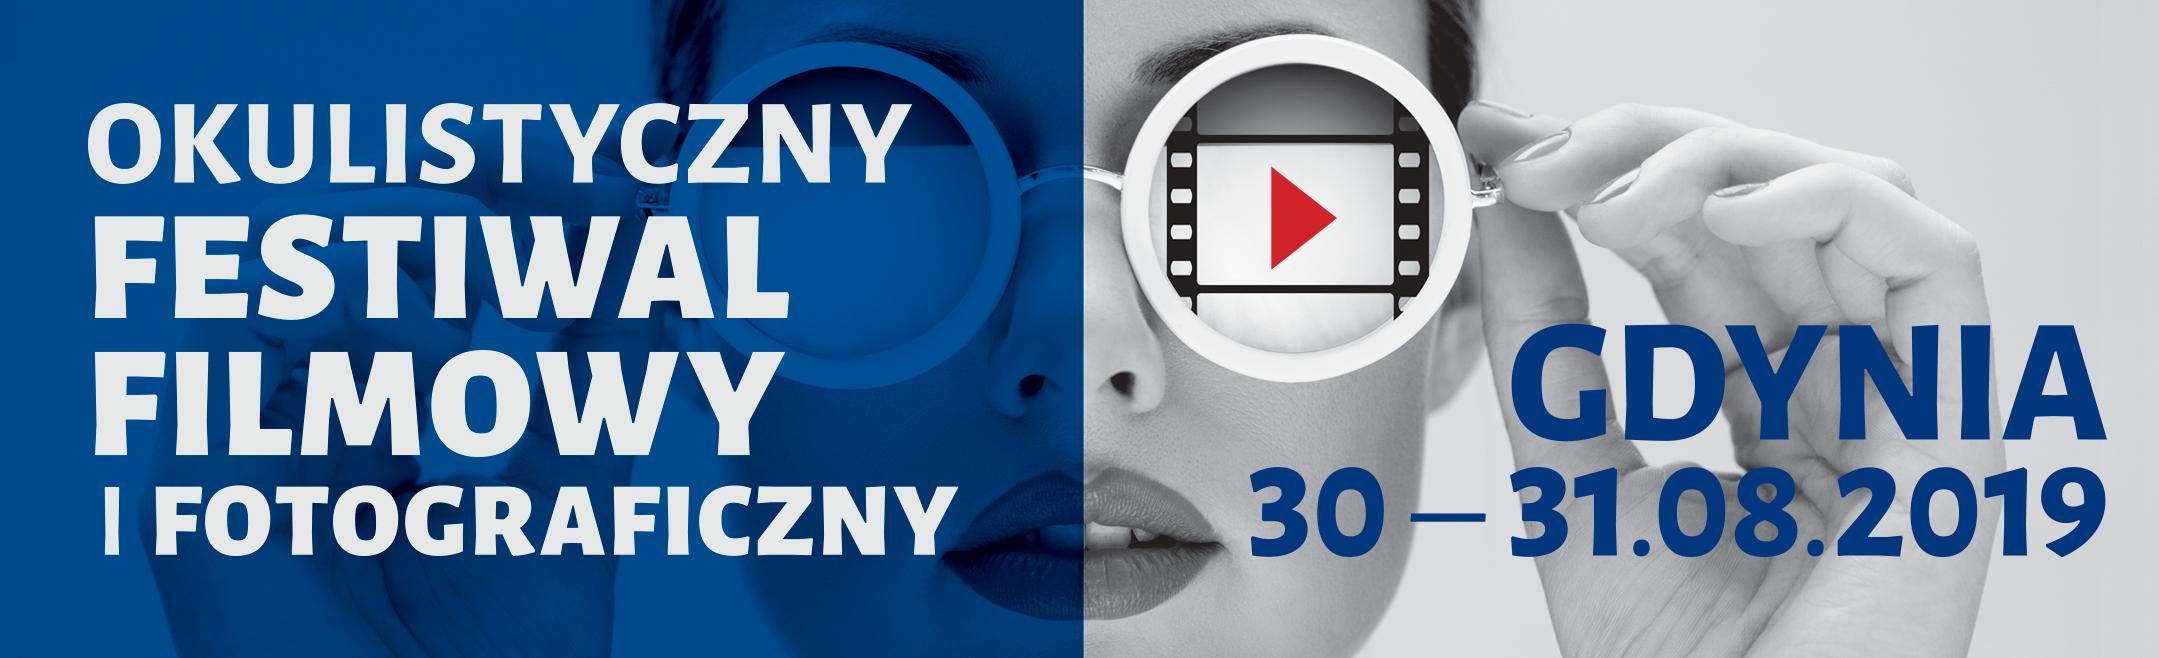 [:pl]I Okulistyczny Festiwal Filmowy OFF[:en]3rd European Meeting of Young Ophthalmology EMYO[:]